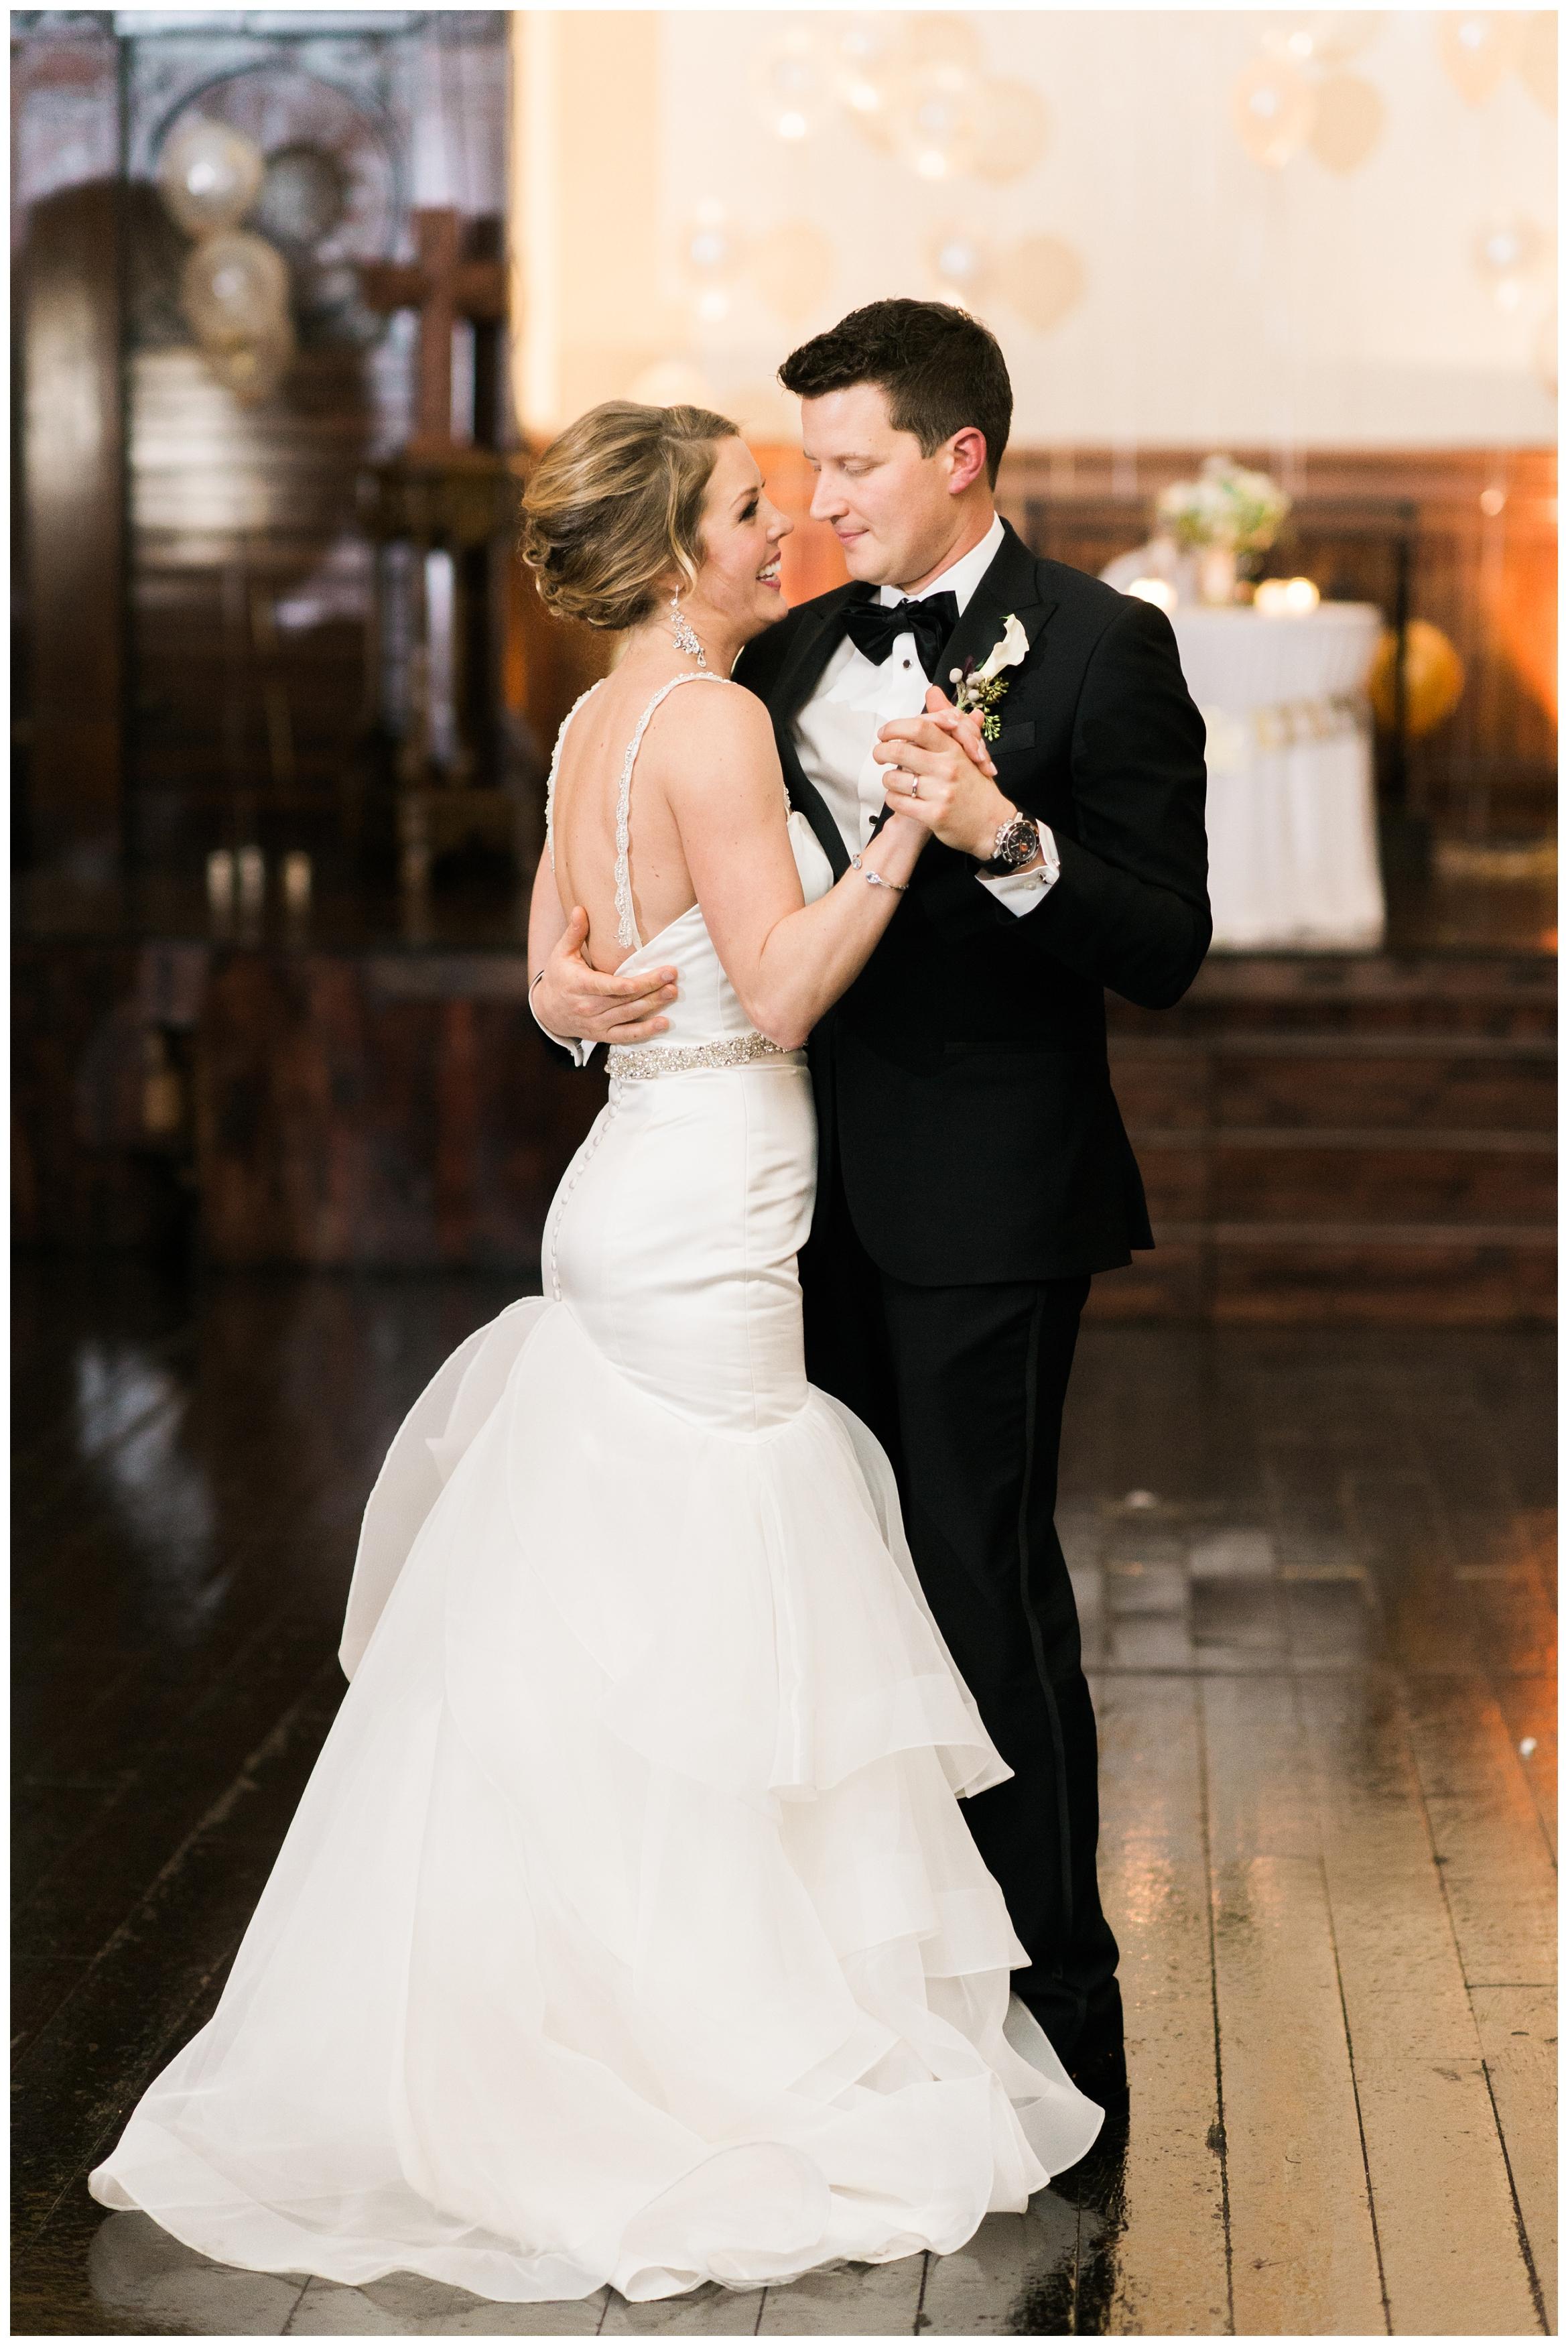 Rebecca_Bridges_Photography_Indianapolis_Wedding_Photographer_5851.jpg